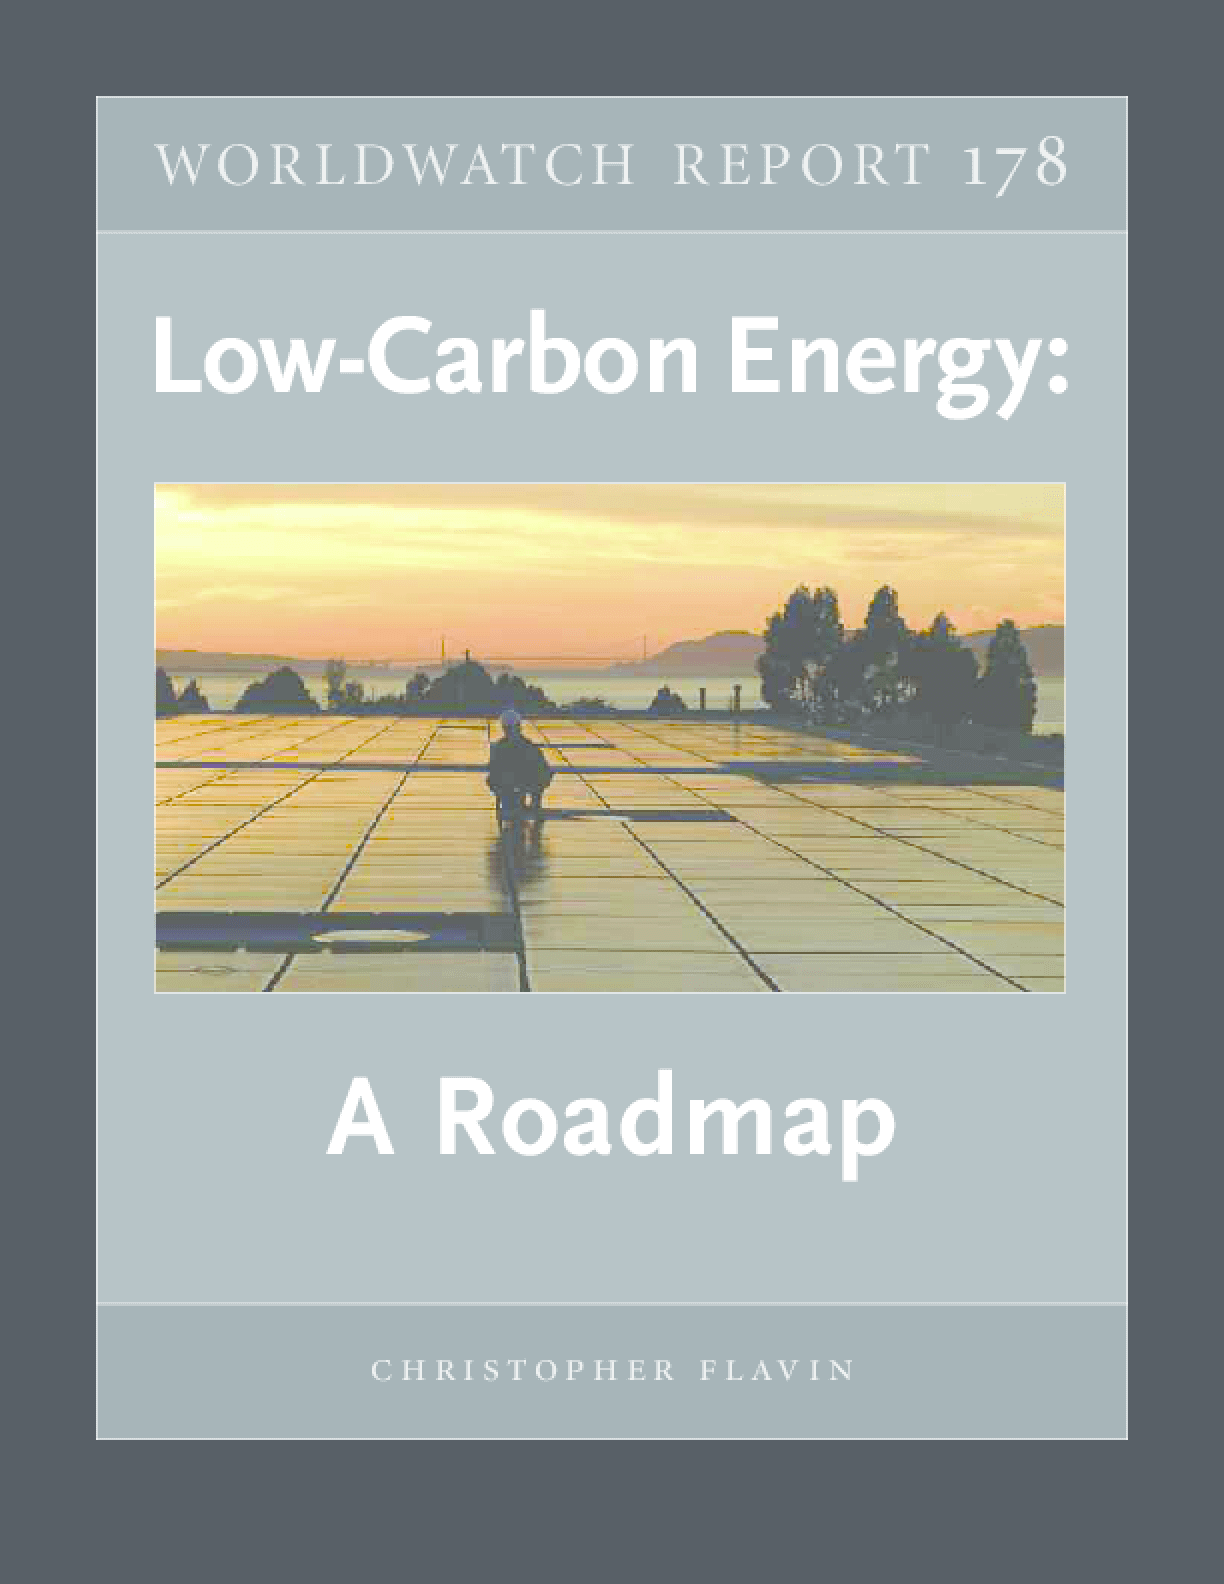 Low-carbon energy: a roadmap